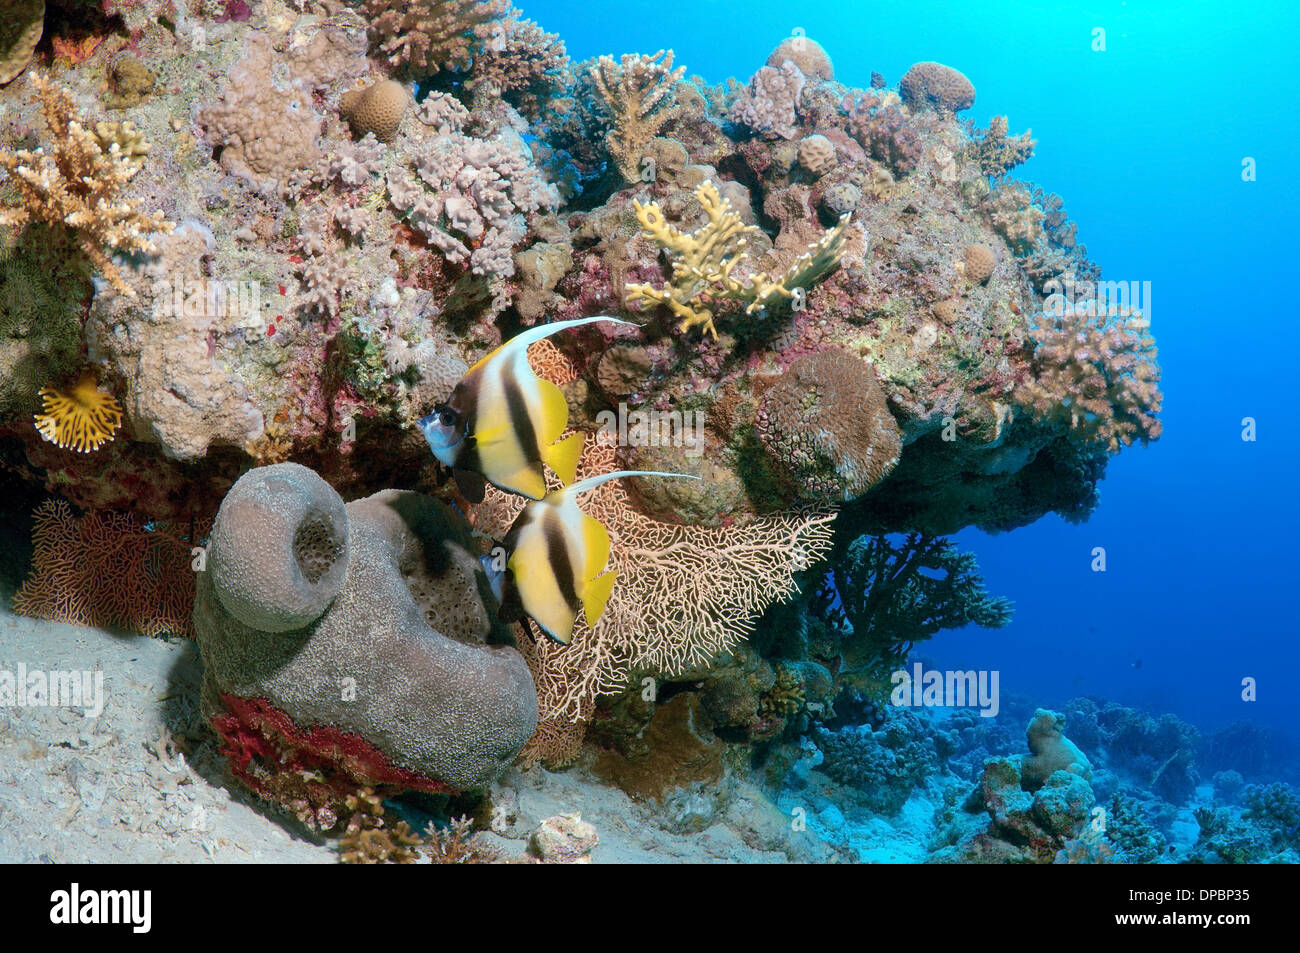 Pennant coralfish, longfin bannerfish or coachman (Heniochus acuminatus) Red sea, Egypt, Africa - Stock Image